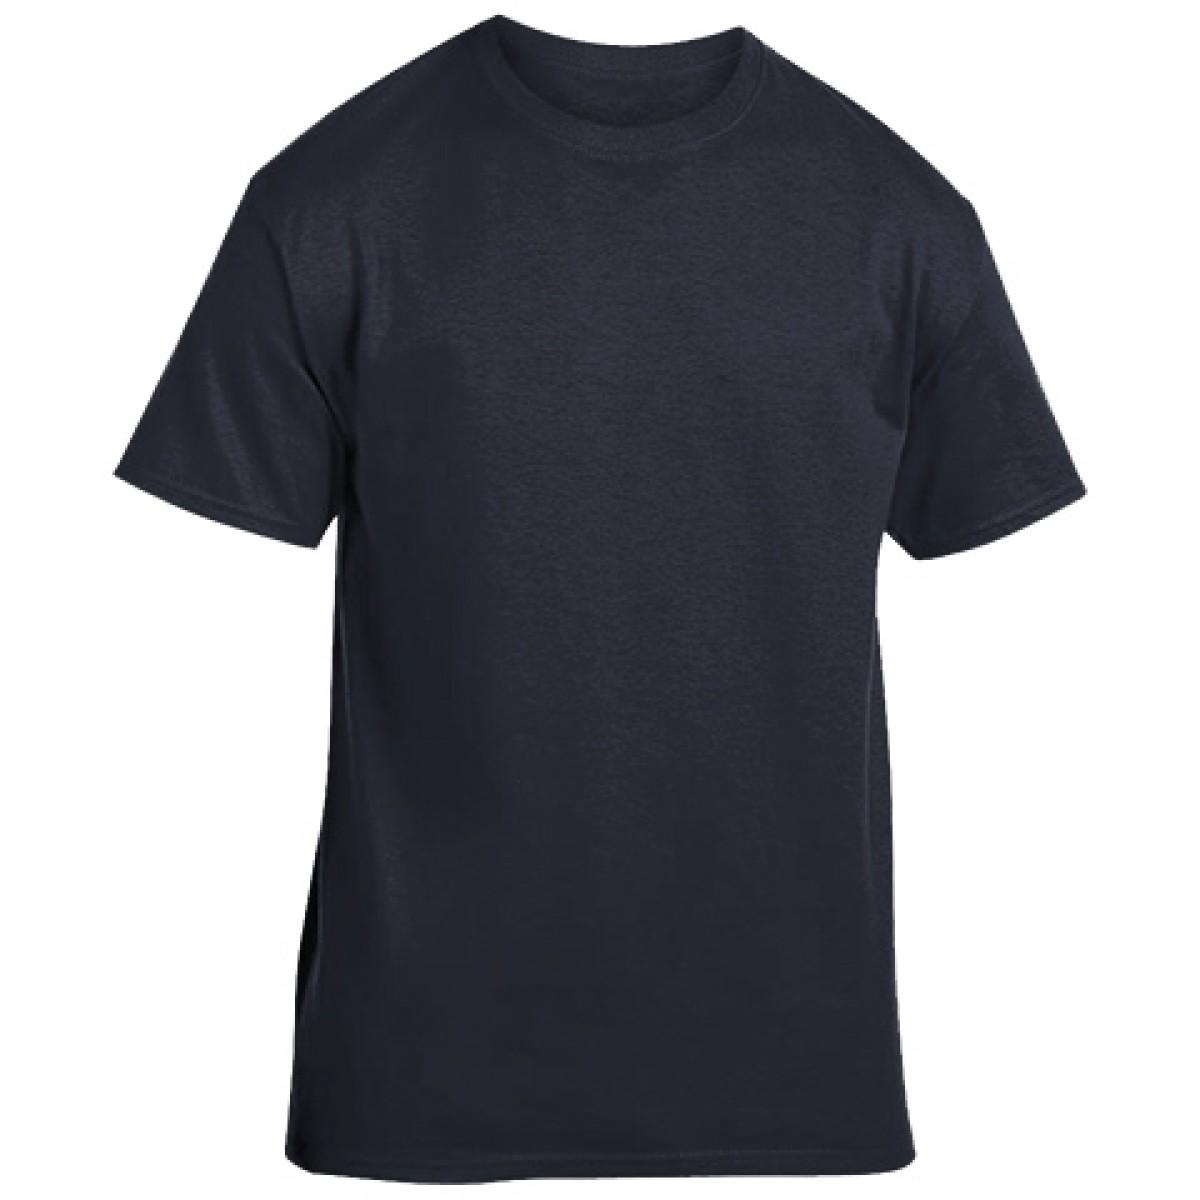 Soft 100% Cotton T-Shirt-Heather Navy-S